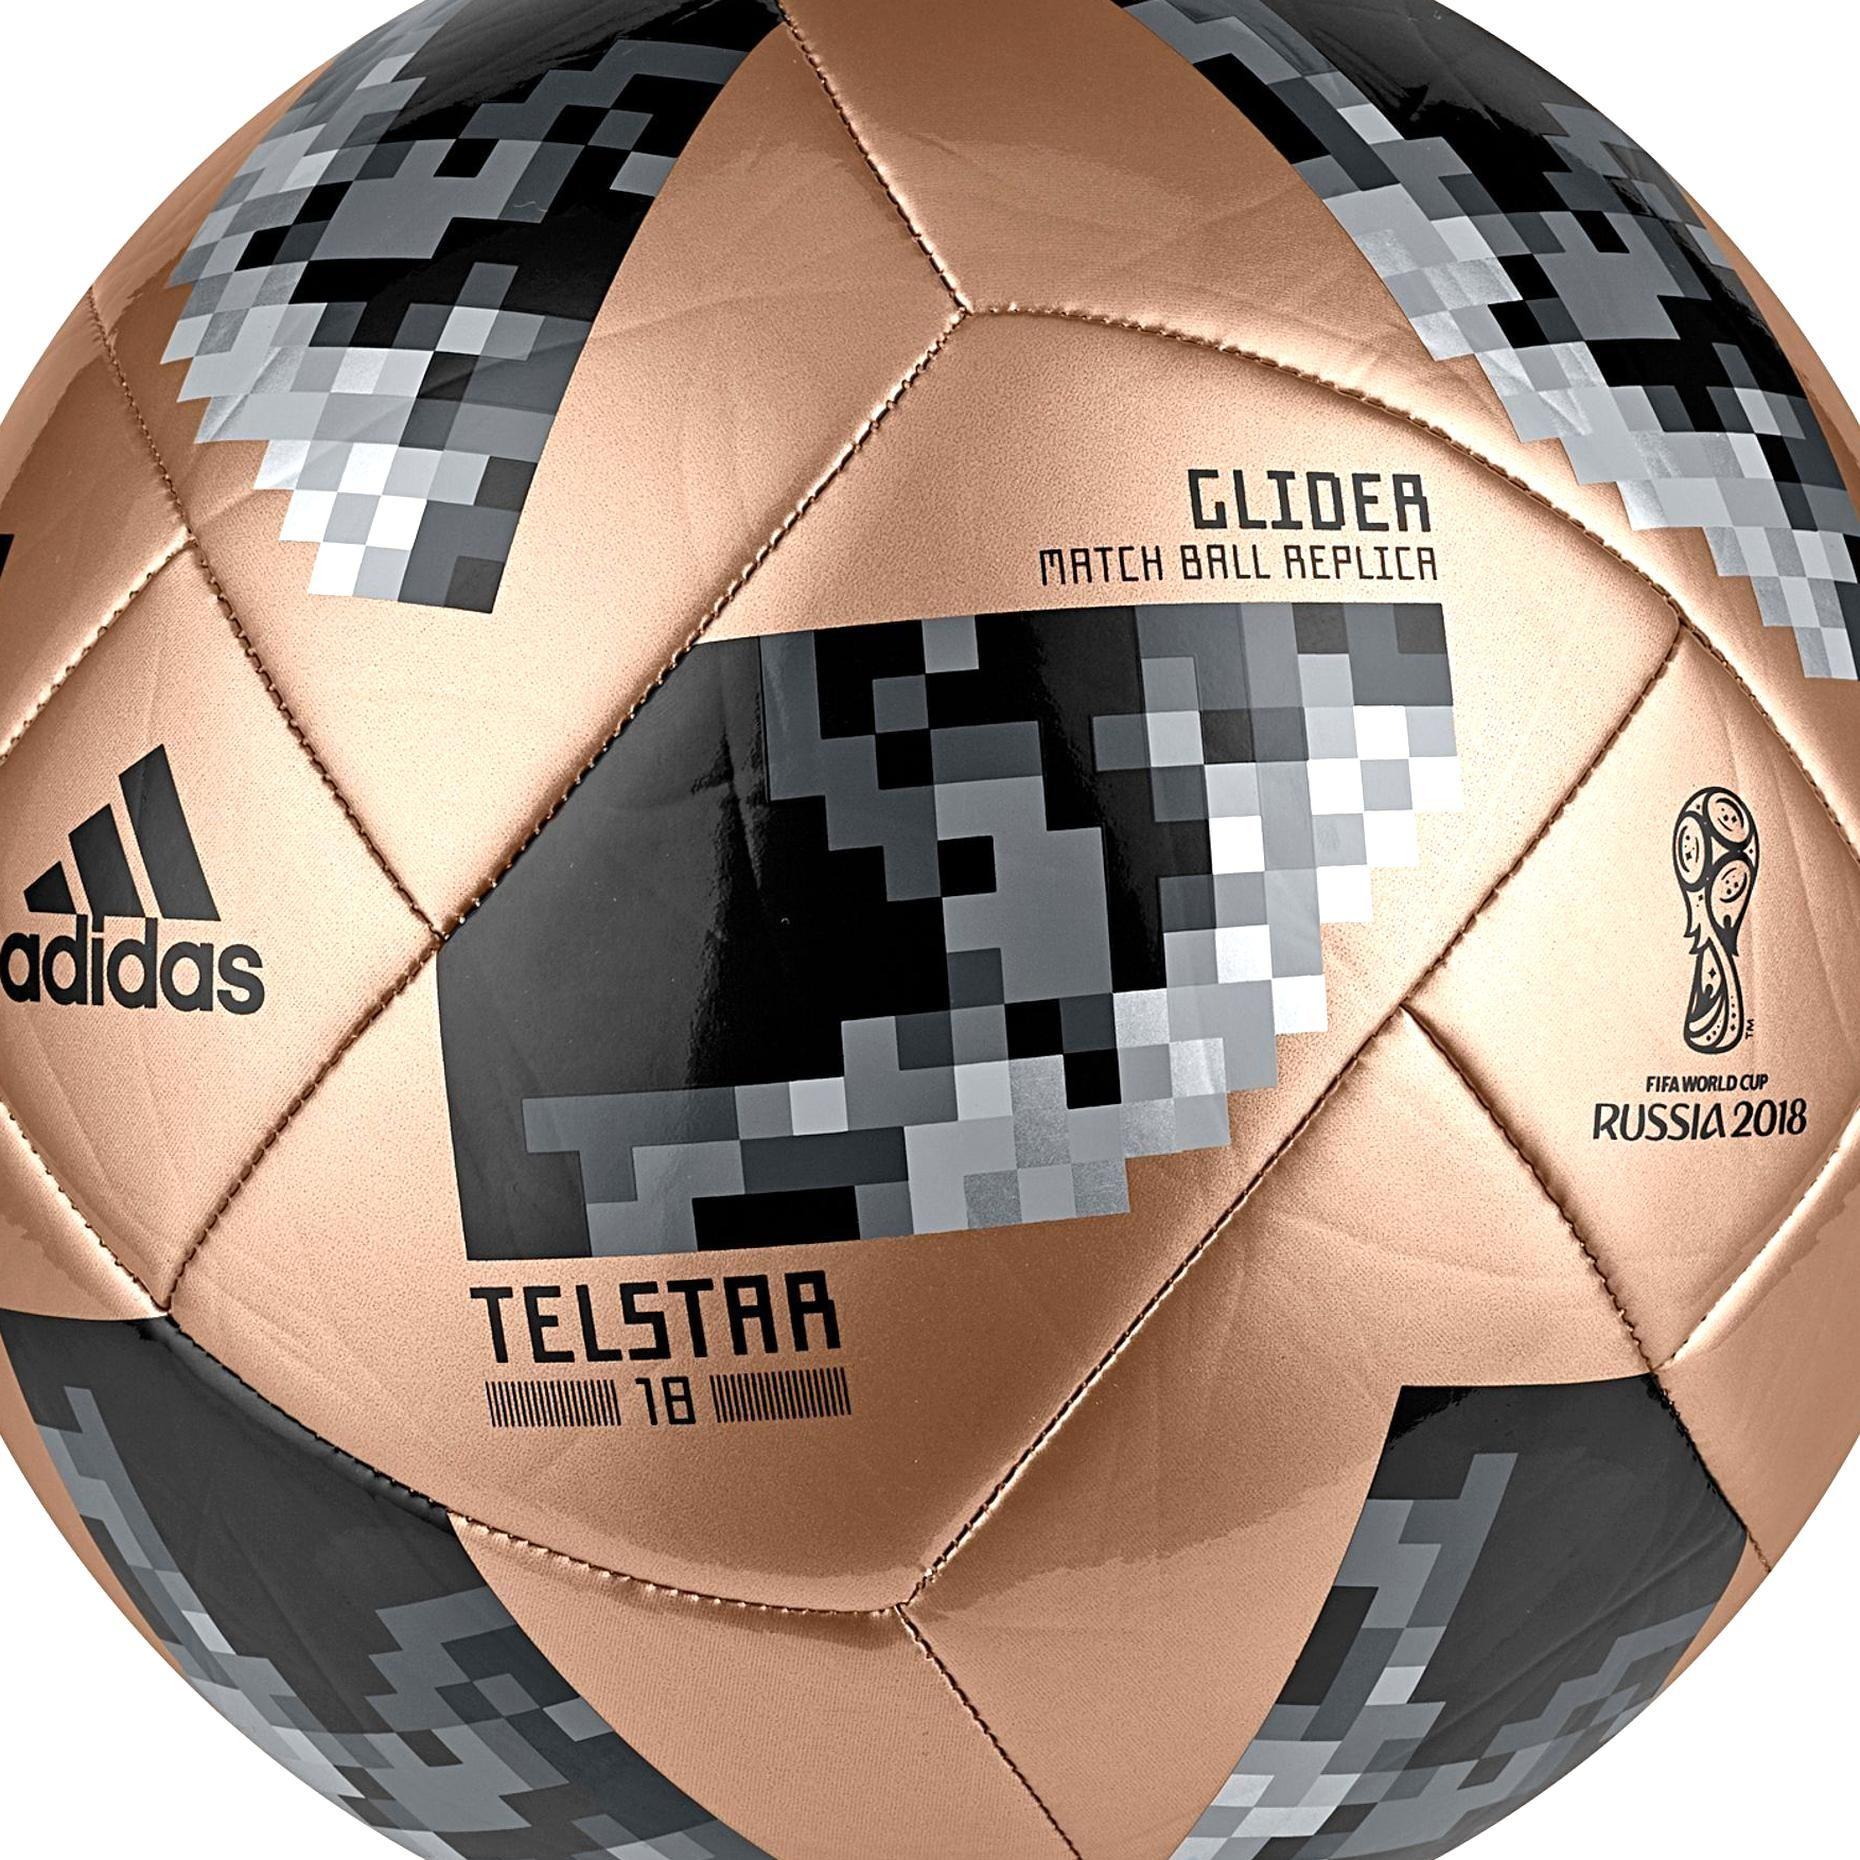 Adidas 2018 Fifa World Cup Russia Telstar Glider Soccer Ball Goldblack In 2020 Soccer Ball Soccer Fifa World Cup